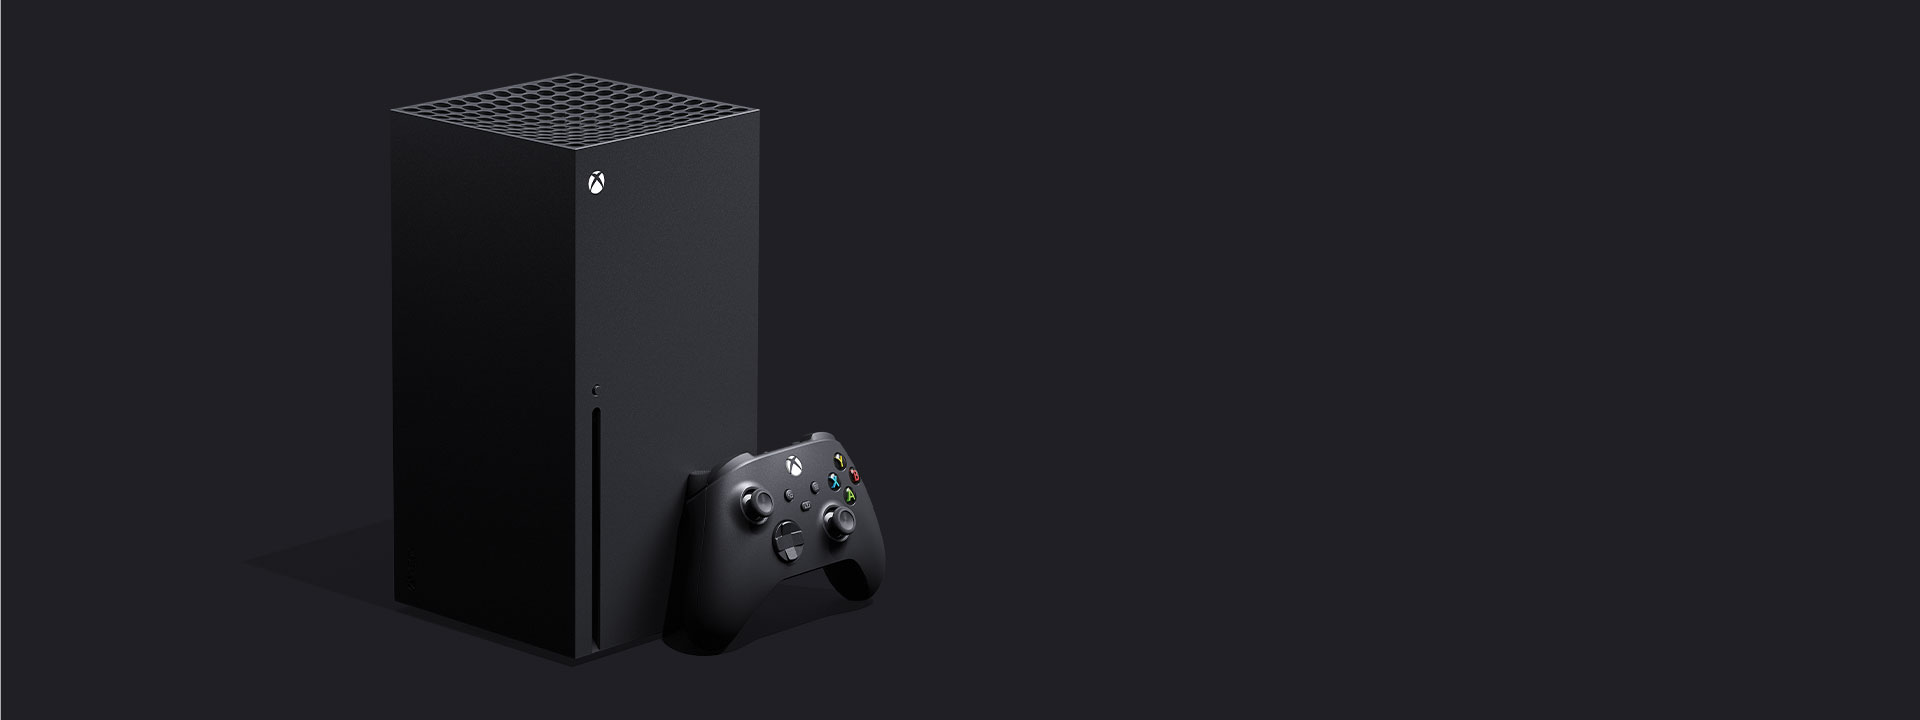 microsoft-testa-modo-noturno-para-consoles-xbox